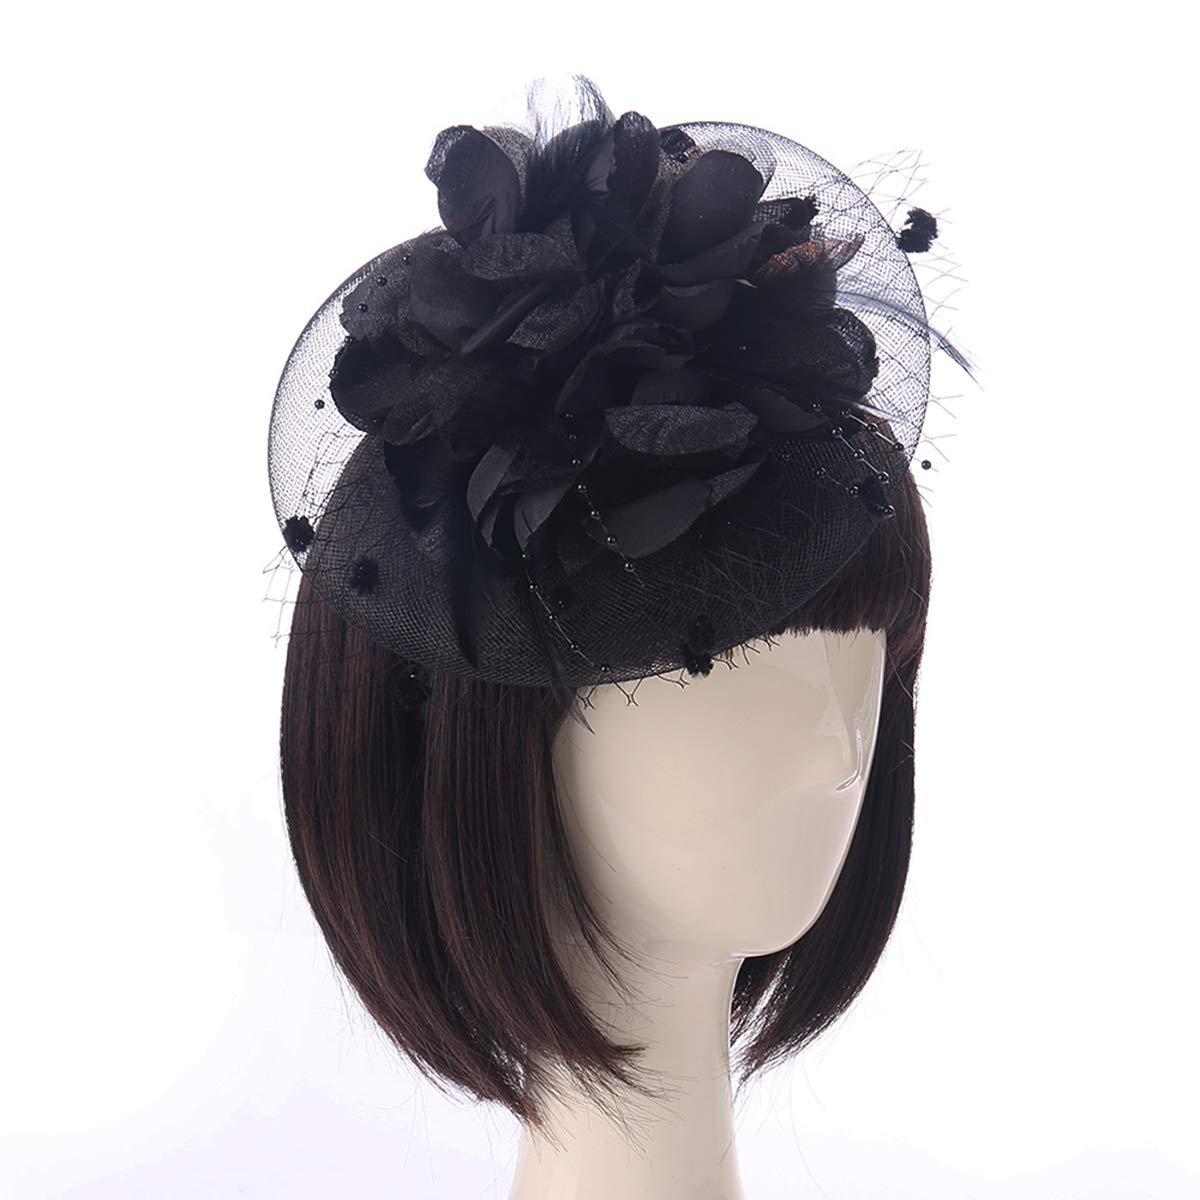 SH-RuiDu Women Girl Fascinator Hat, Fashion Vintage Mesh Flower Feathers Clip Cocktail Party Headwear Hat